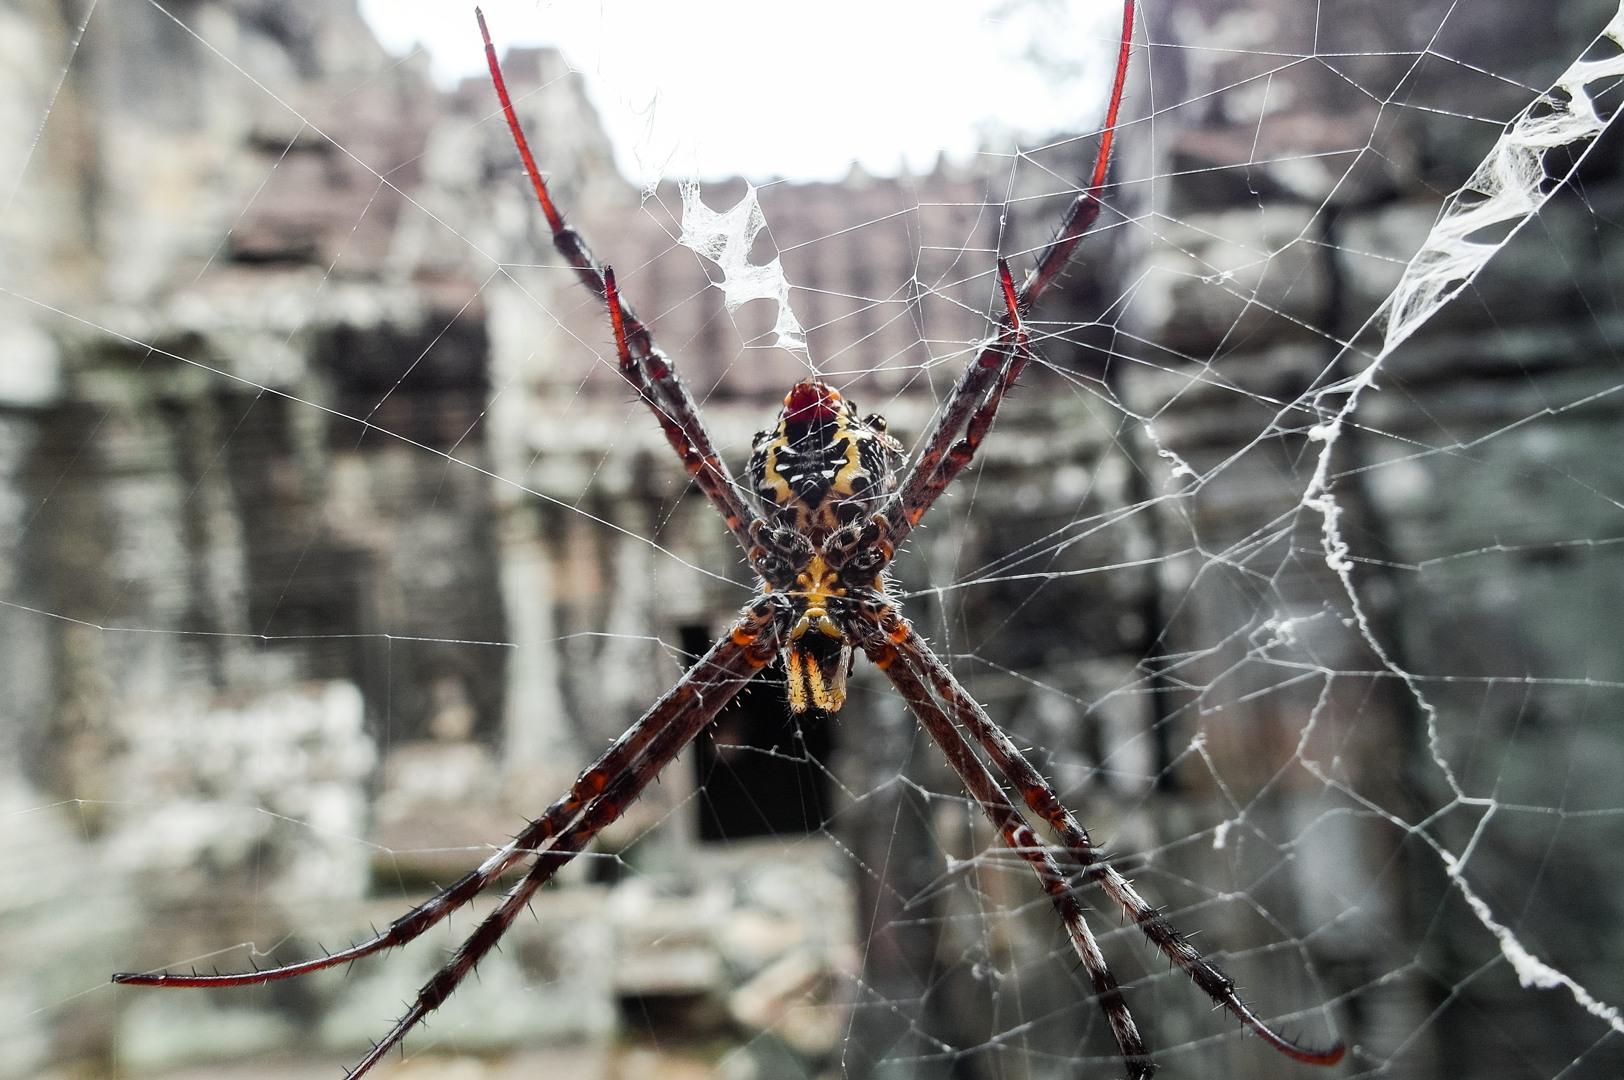 паук в храме Бантей Кдей (Banteay Kdei), Ангкор